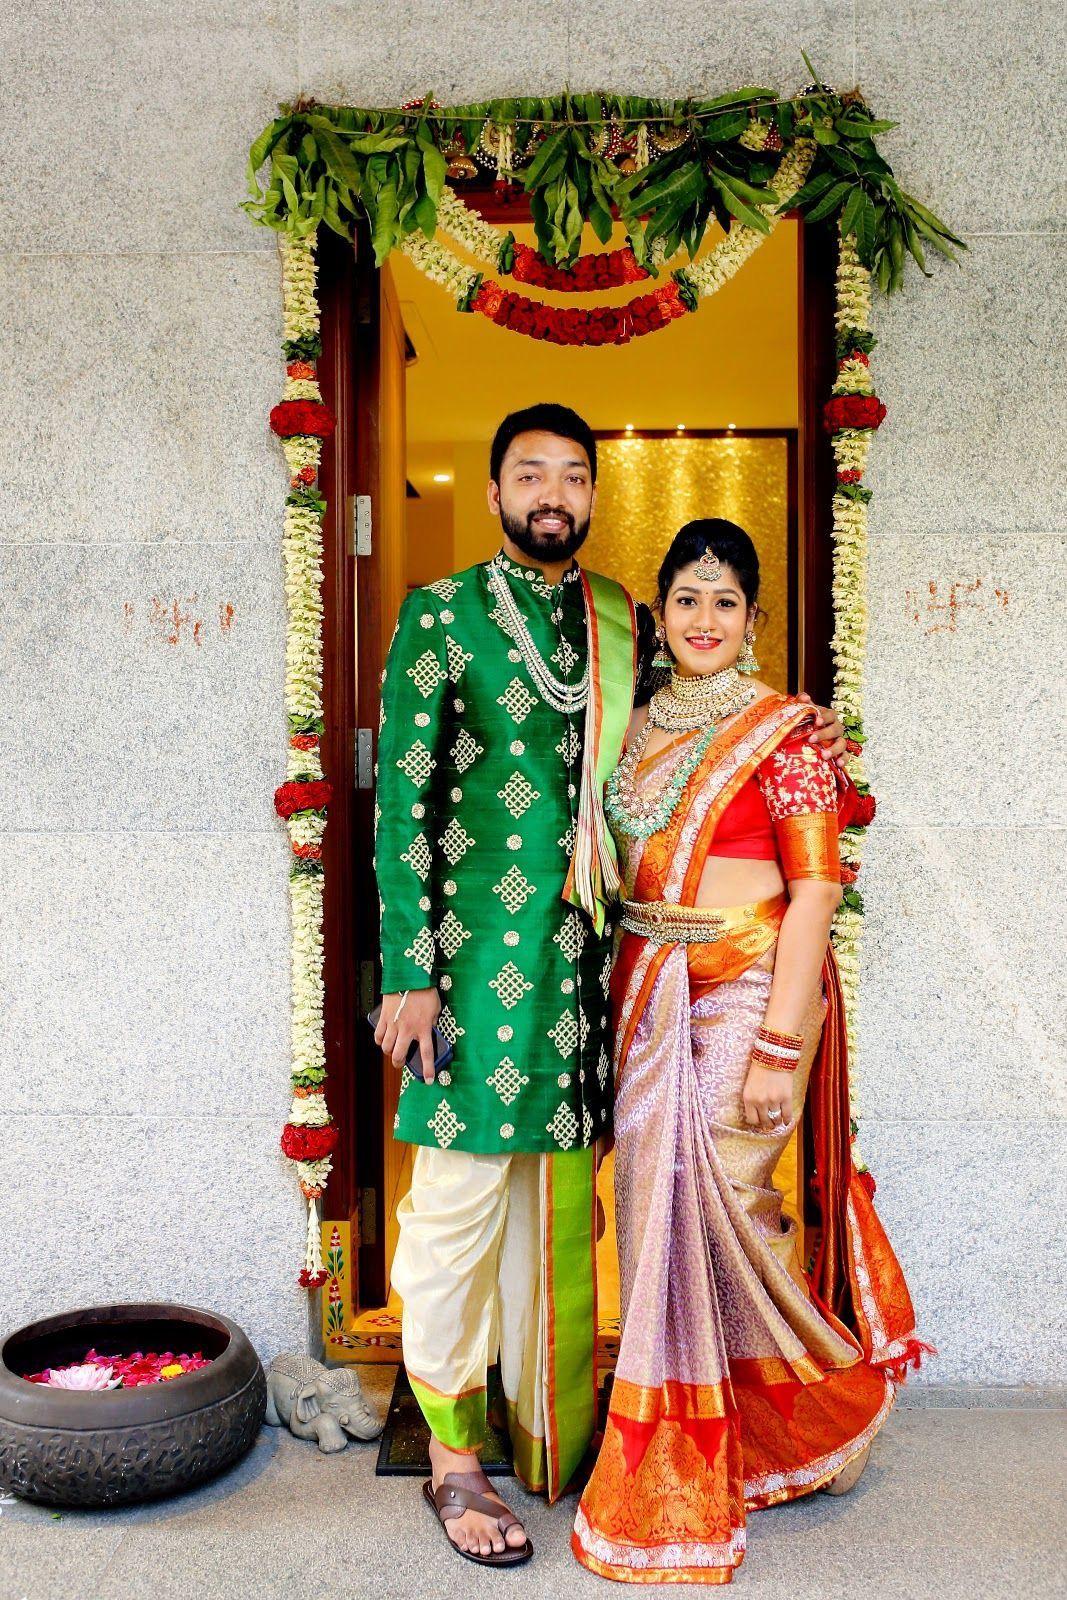 Pin by Aparna Gadiraju on saress Wedding outfits for